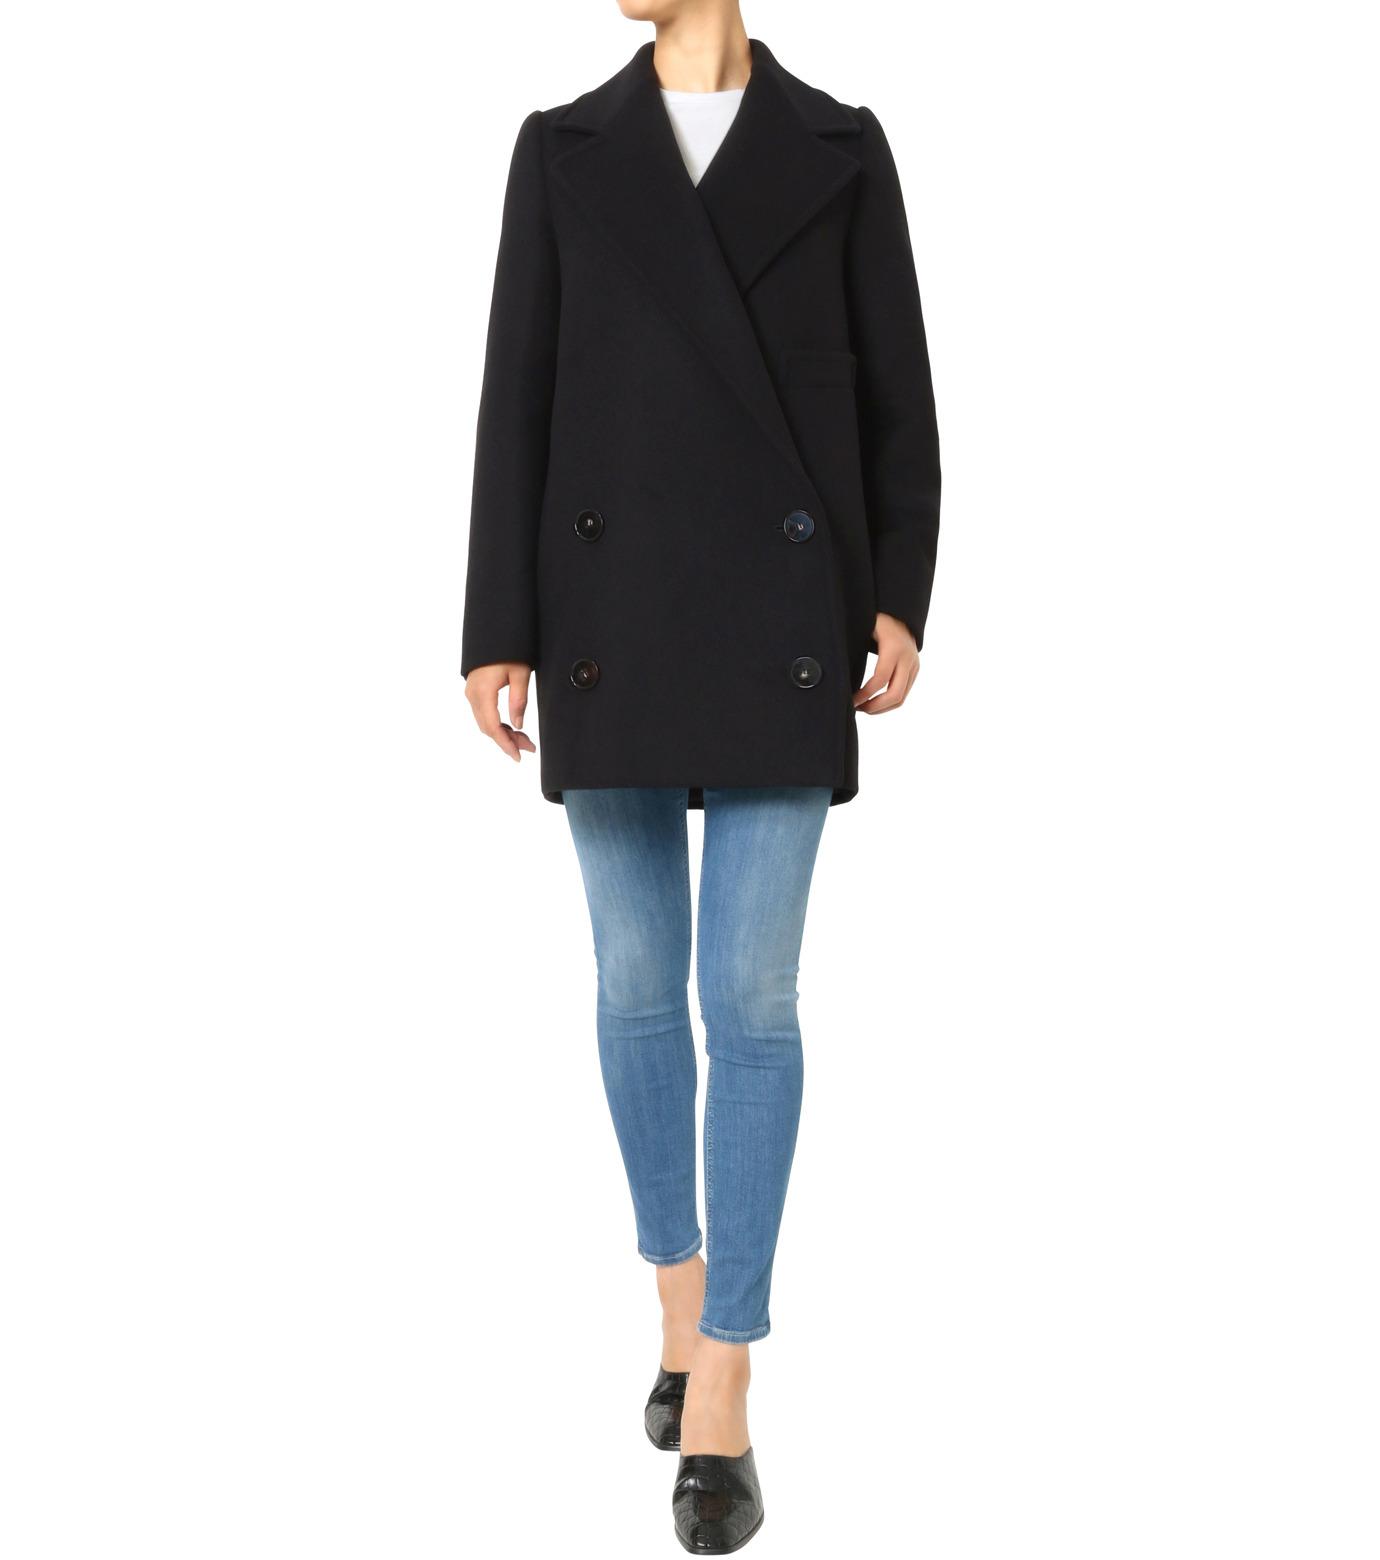 Stella McCartney(ステラマッカートニー)のWool Melton Short Coat-BLACK(コート/coat)-393143-SDB40-13 拡大詳細画像3